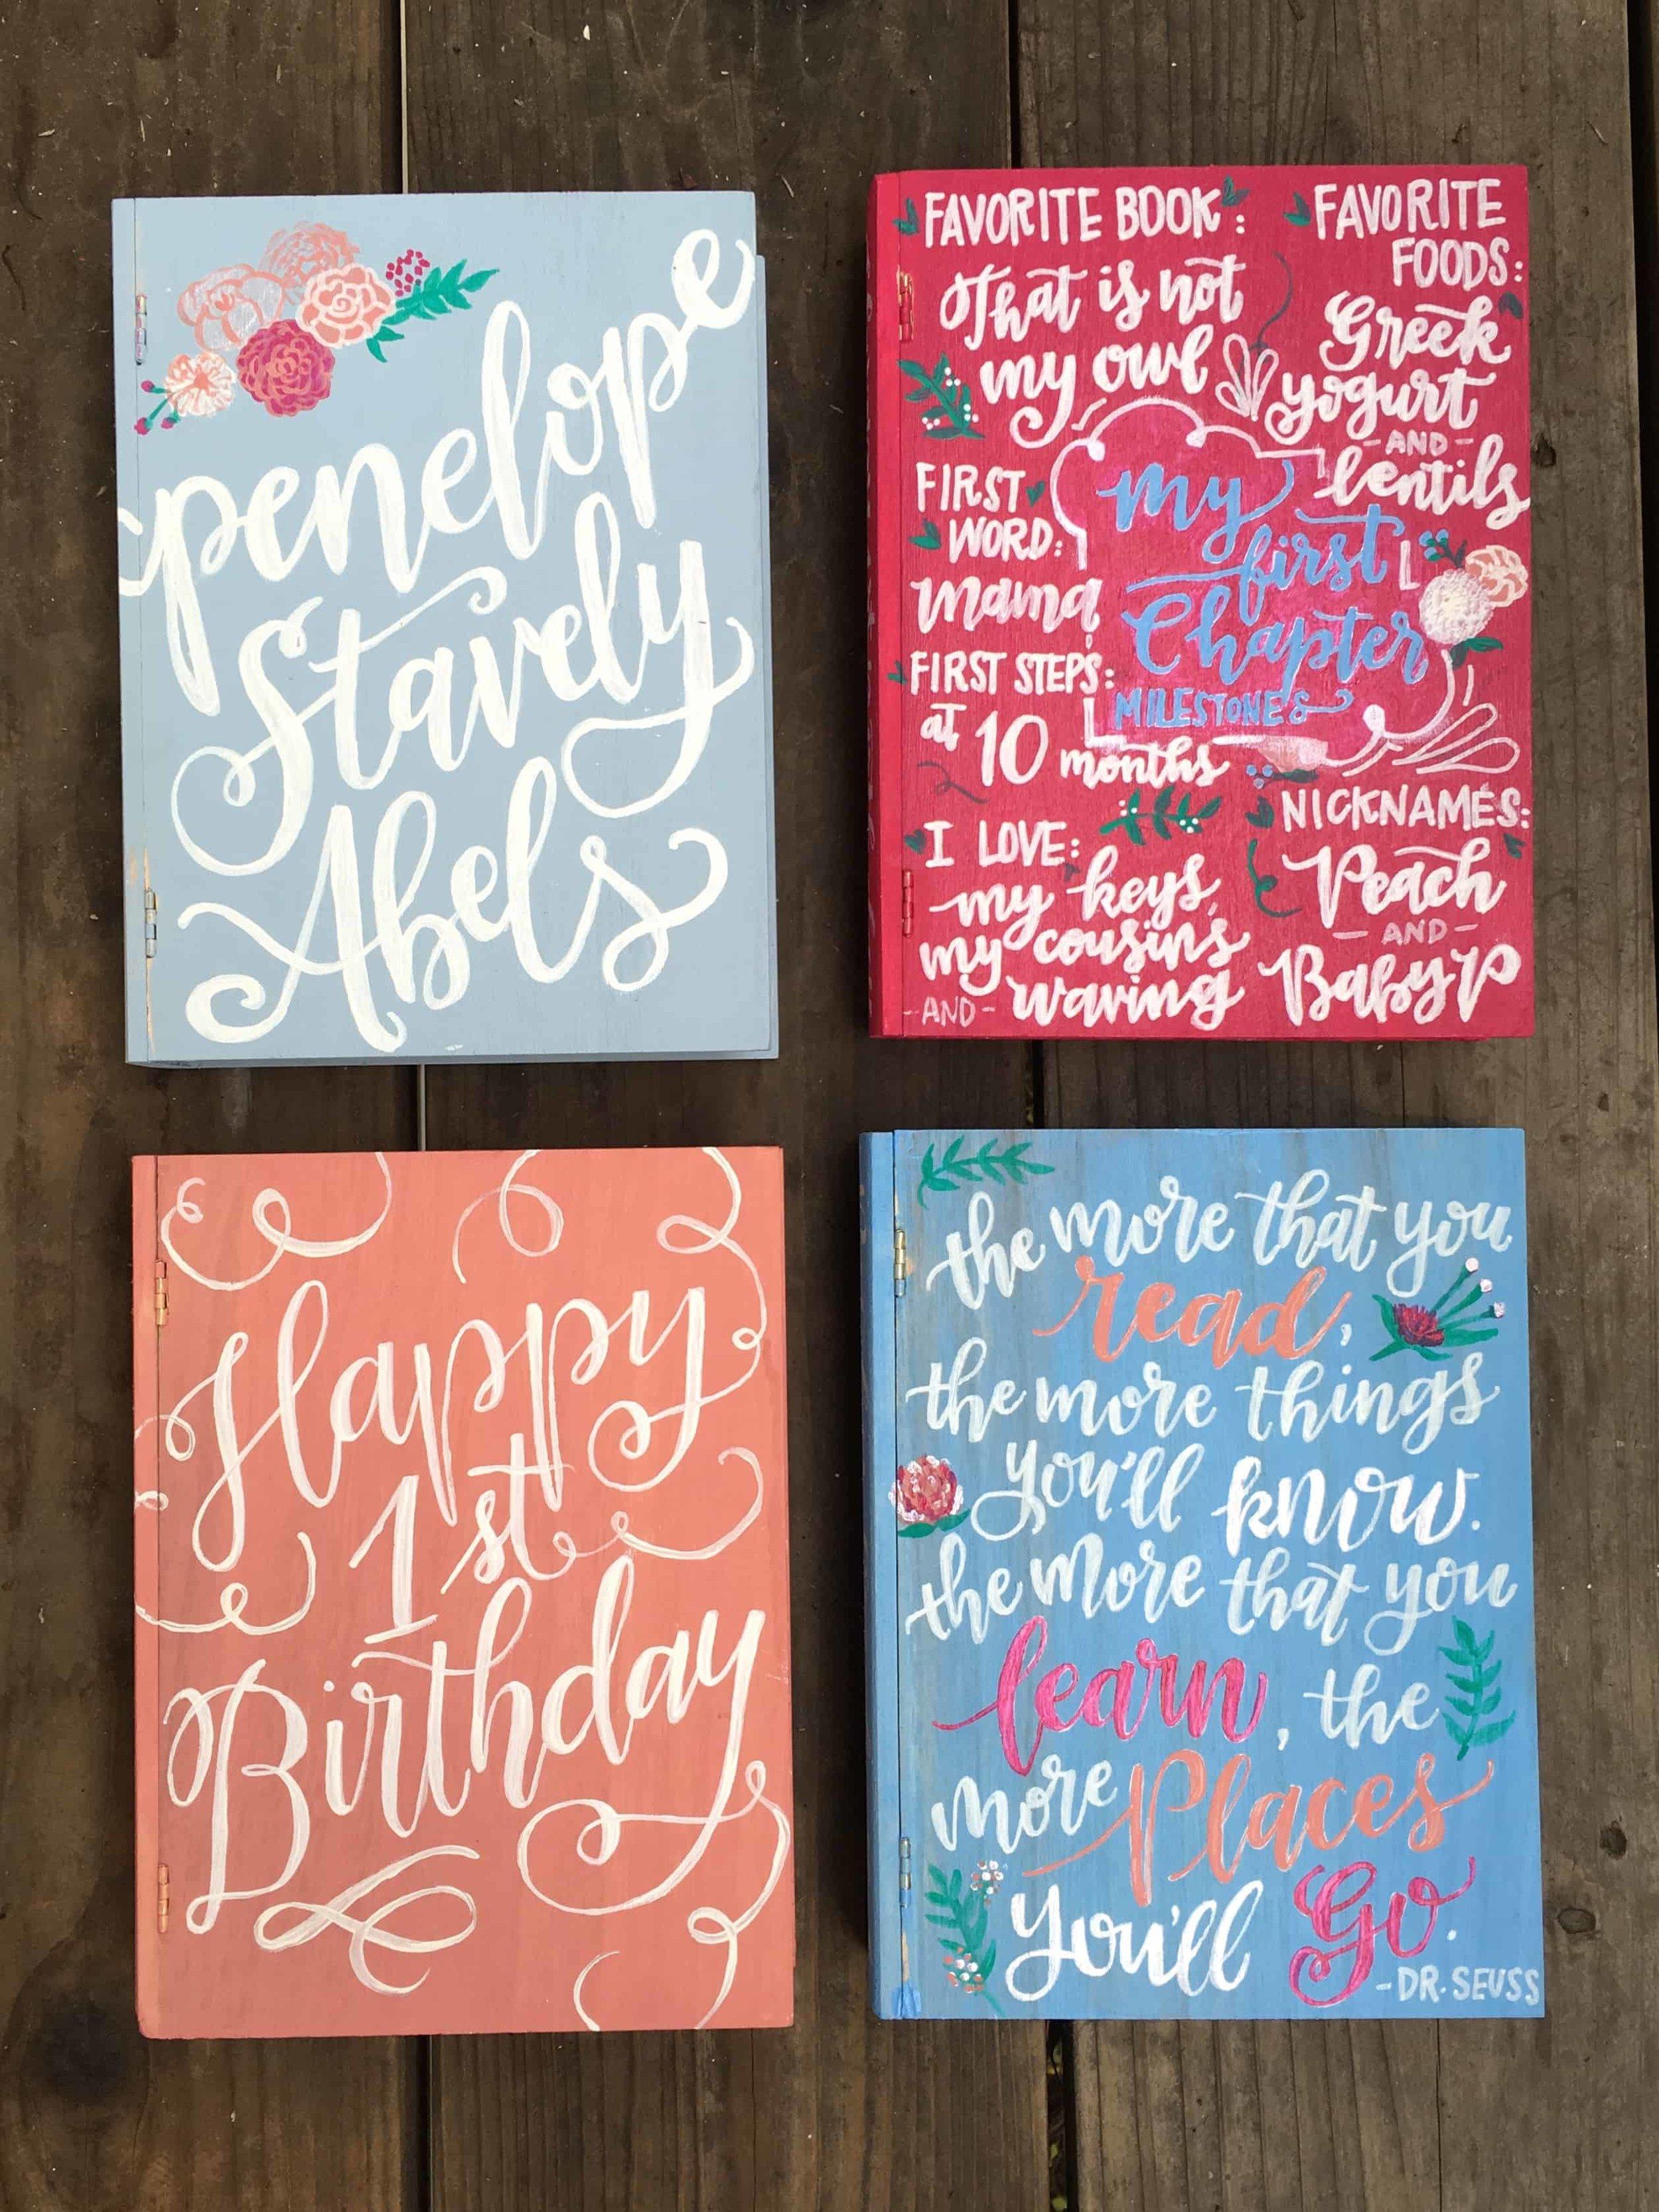 First-Birthday-Book-Party-Details.jpg